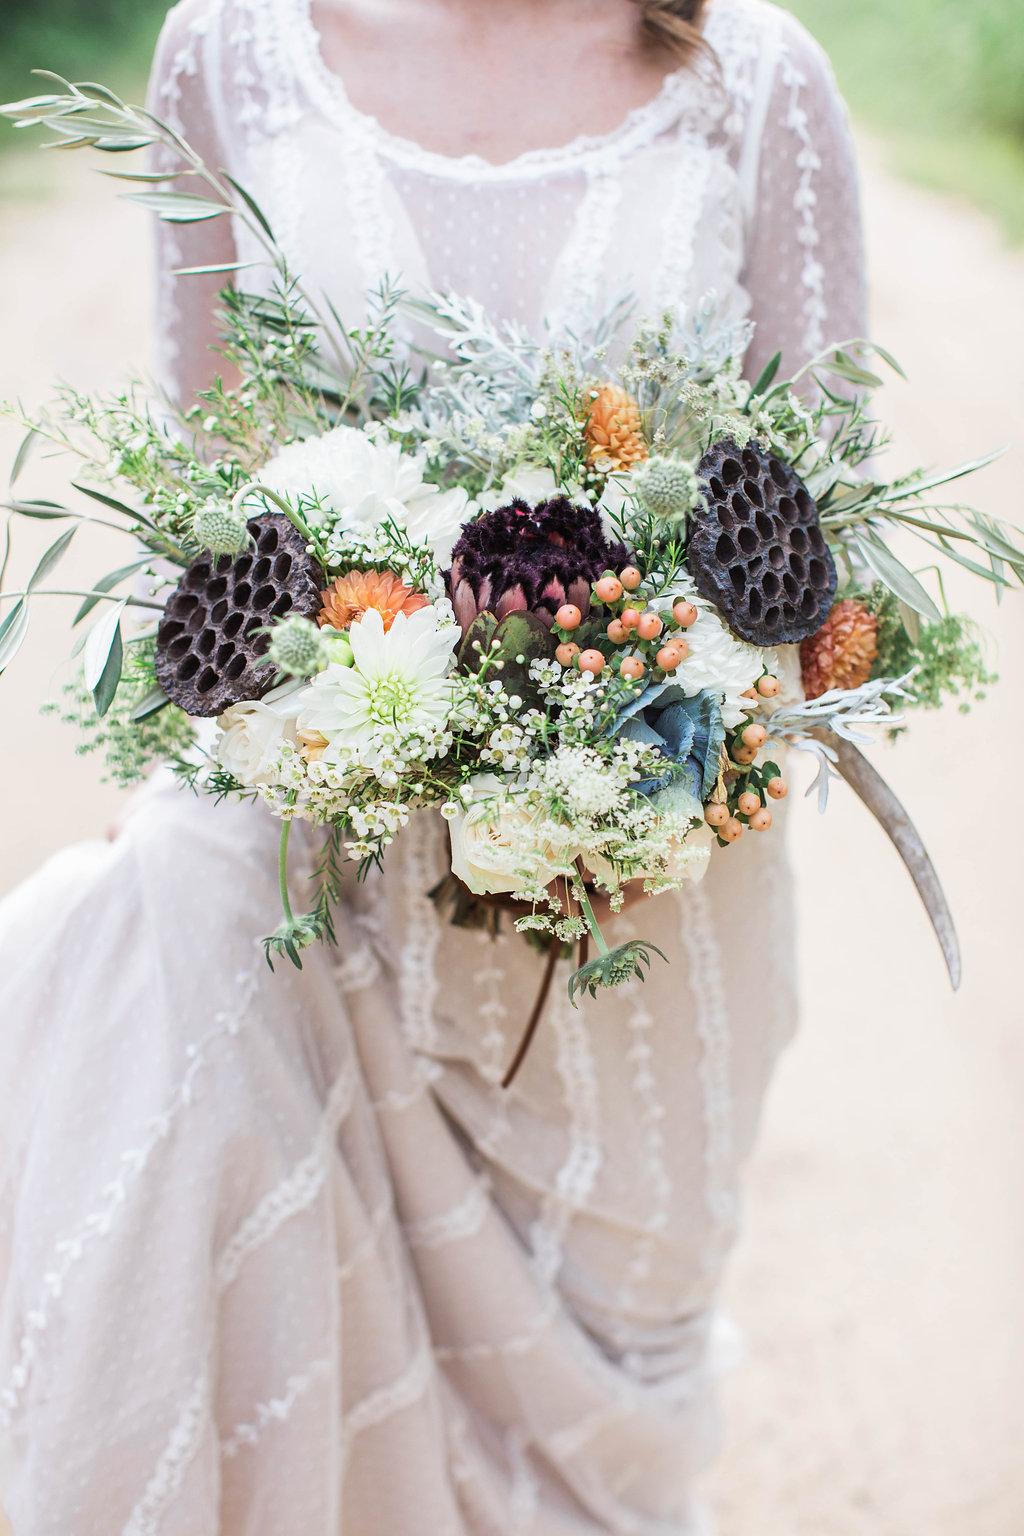 apt-b-photography-ivory-and-beau-bridal-boutique-anna-campbell-isobelle-australian-wedding-the-collins-quarter-savannah-wedding-savannah-weddings-savannah-florist-savannah-bridal-savannah-event-designer-savannah-wedding-dresses-outback-wedding-17.jpg